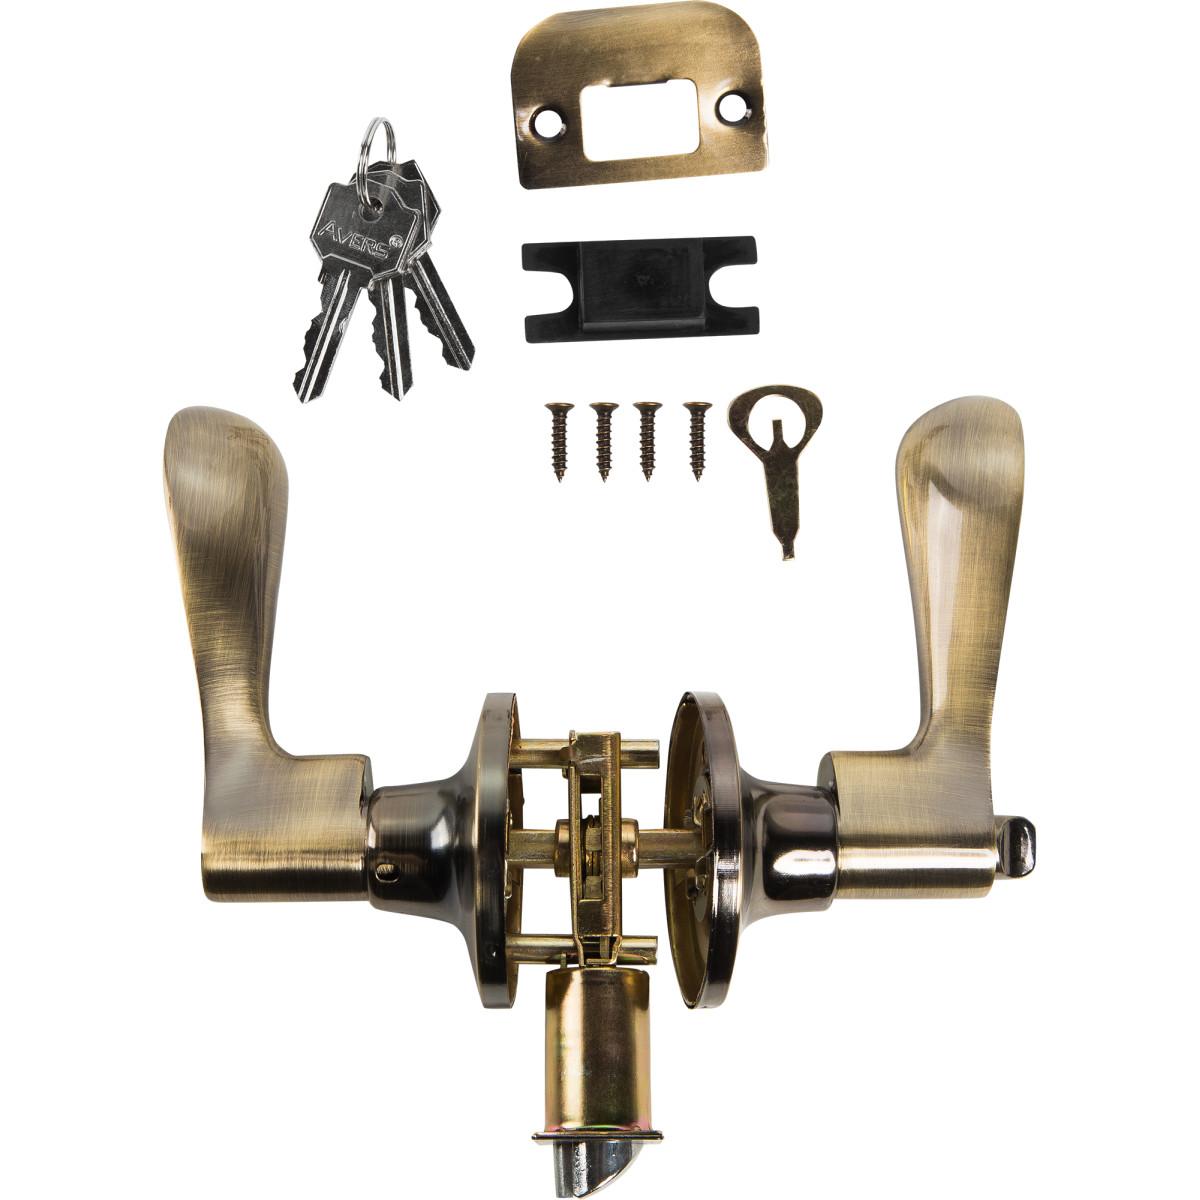 Ручка-Защёлка Avers 8091-01-Ab С Запиранием На Ключ Сталь Цвет Бронза